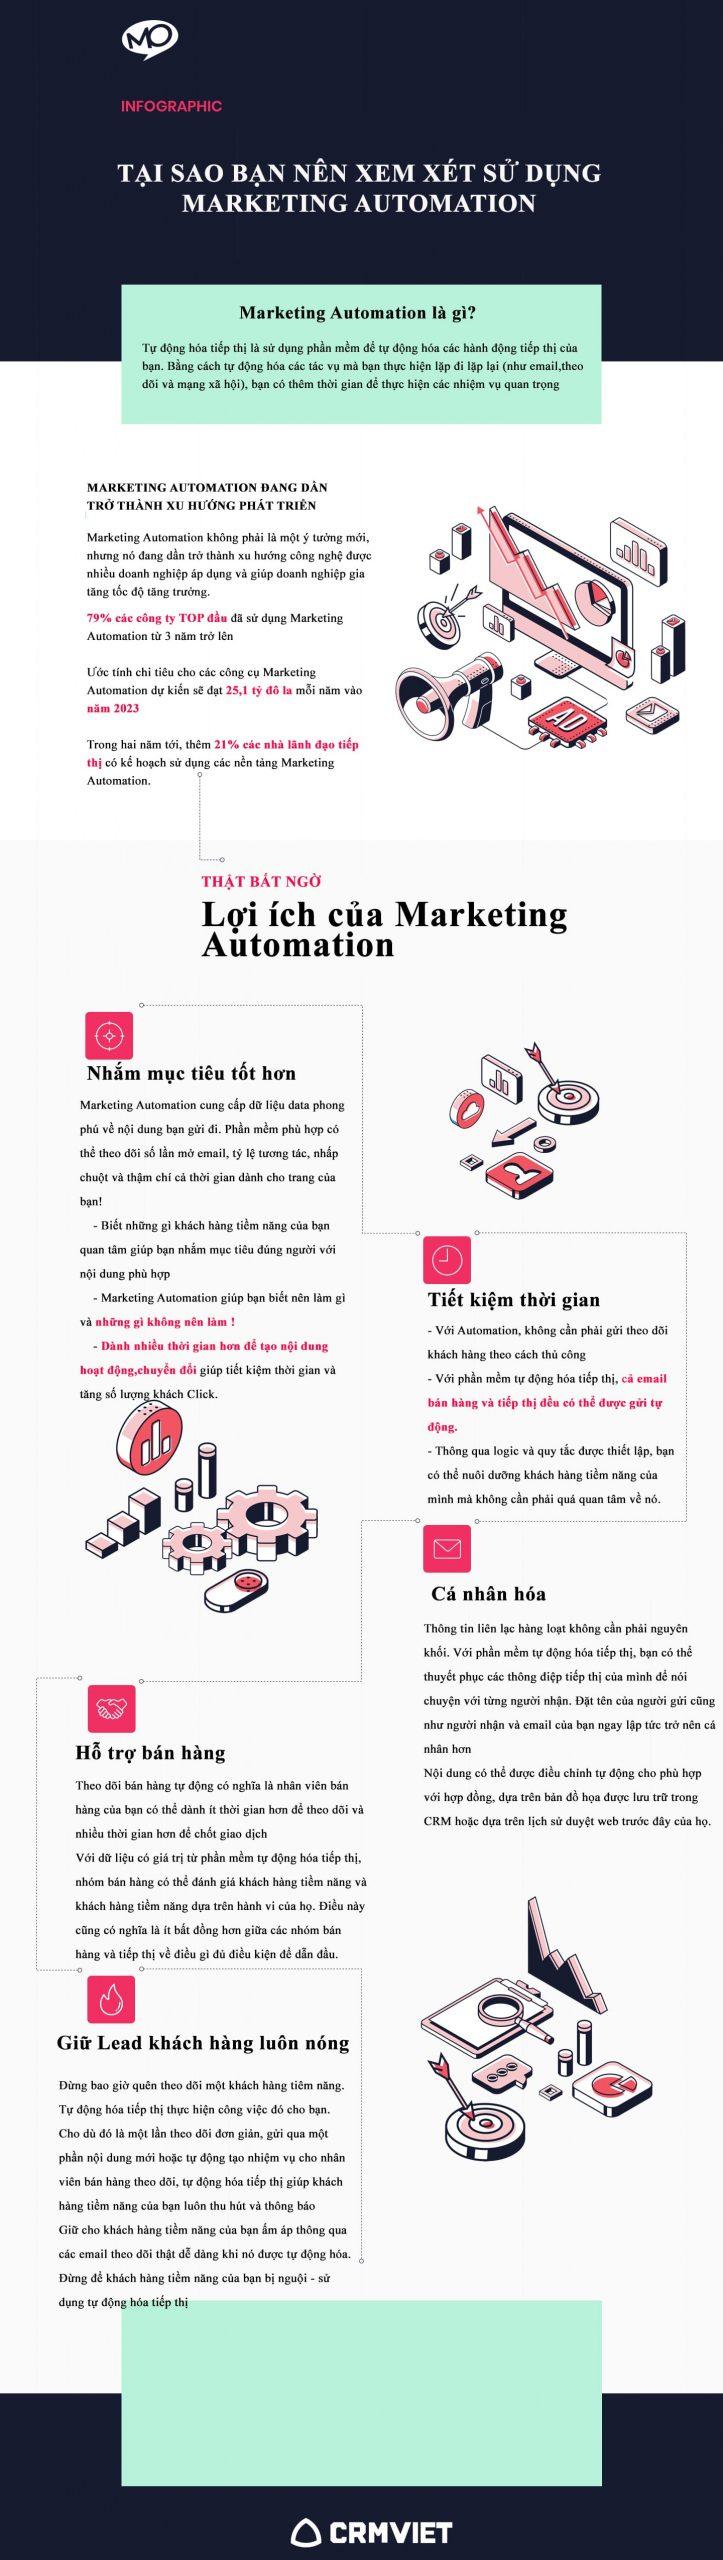 Marketing Automation